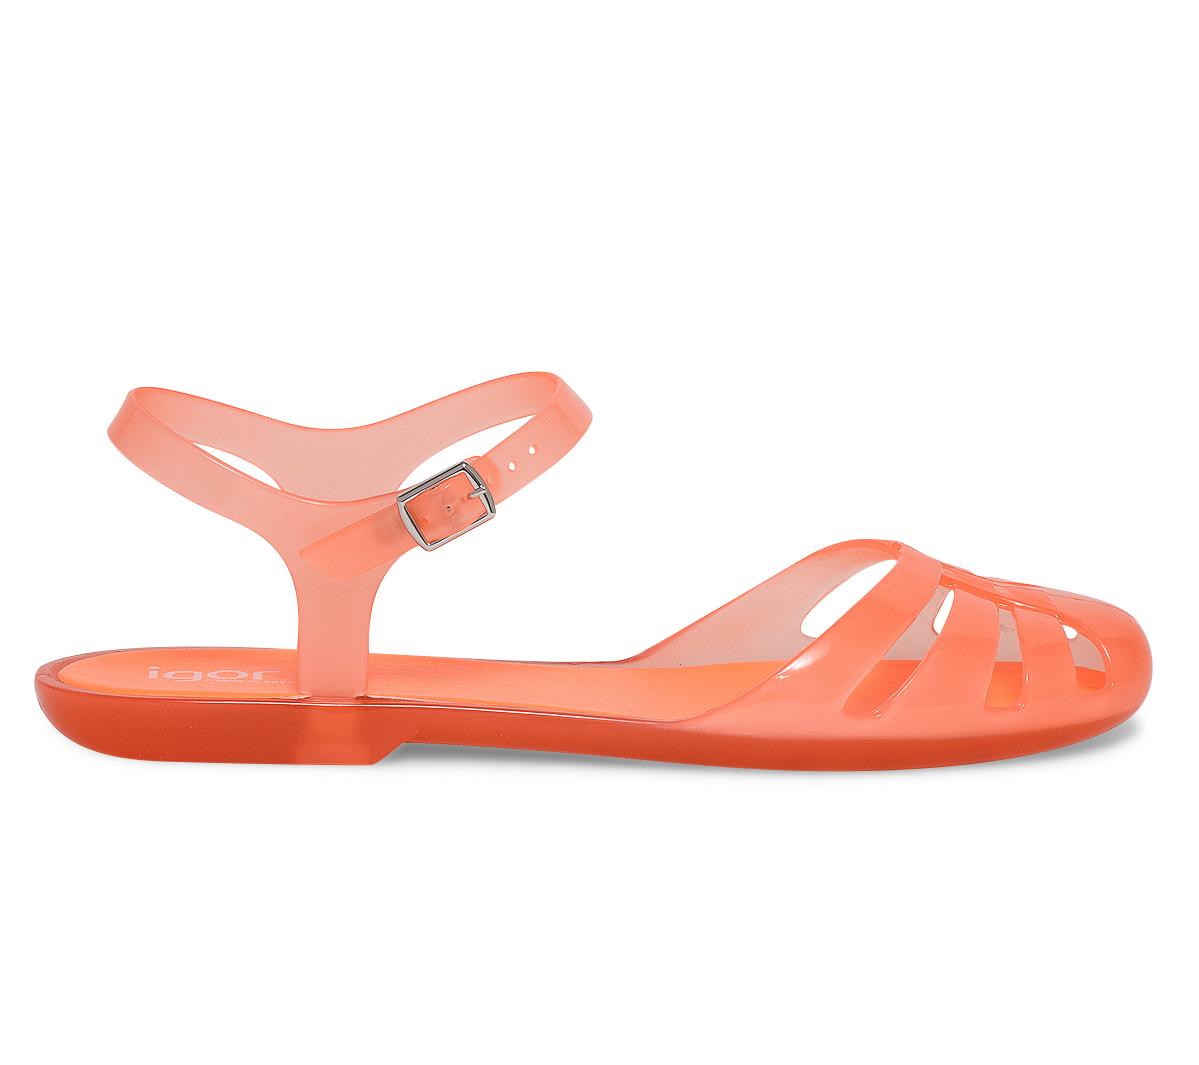 Igor Sandale Sandale Plate Plate Plastique Orange wPN80OnkX